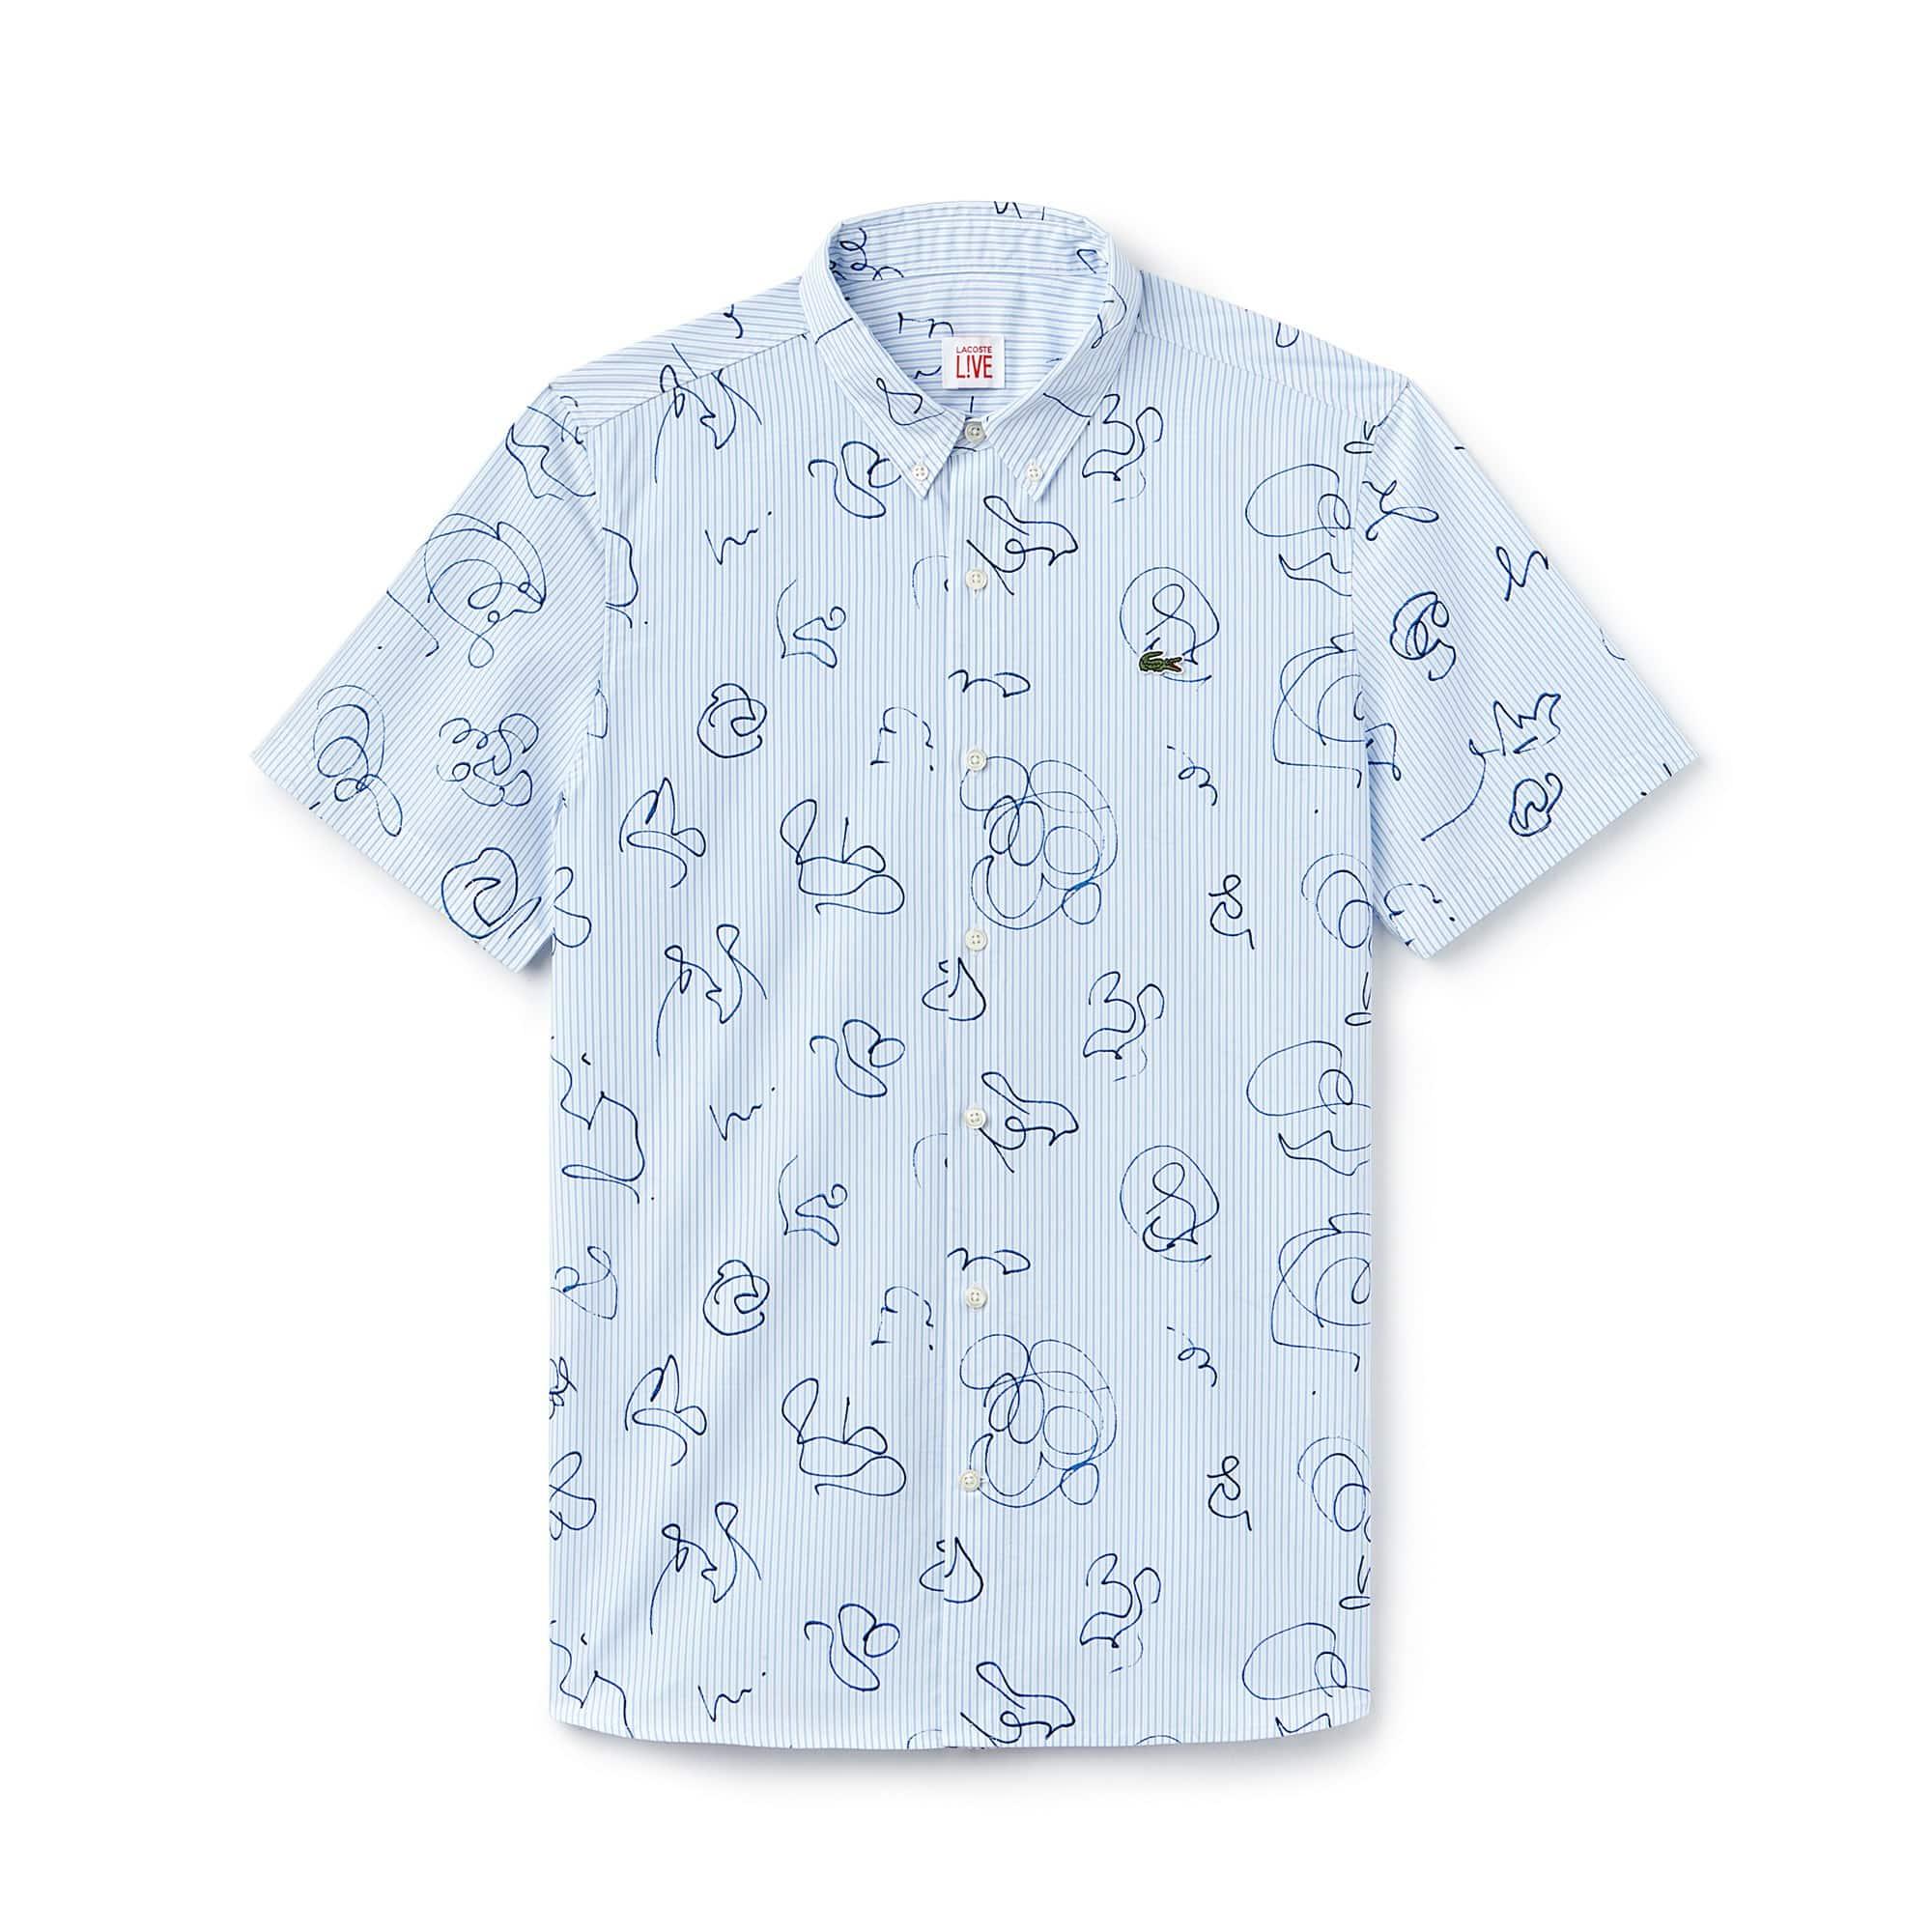 Herren LACOSTE LIVE Popeline Hemd mit Streifenprint